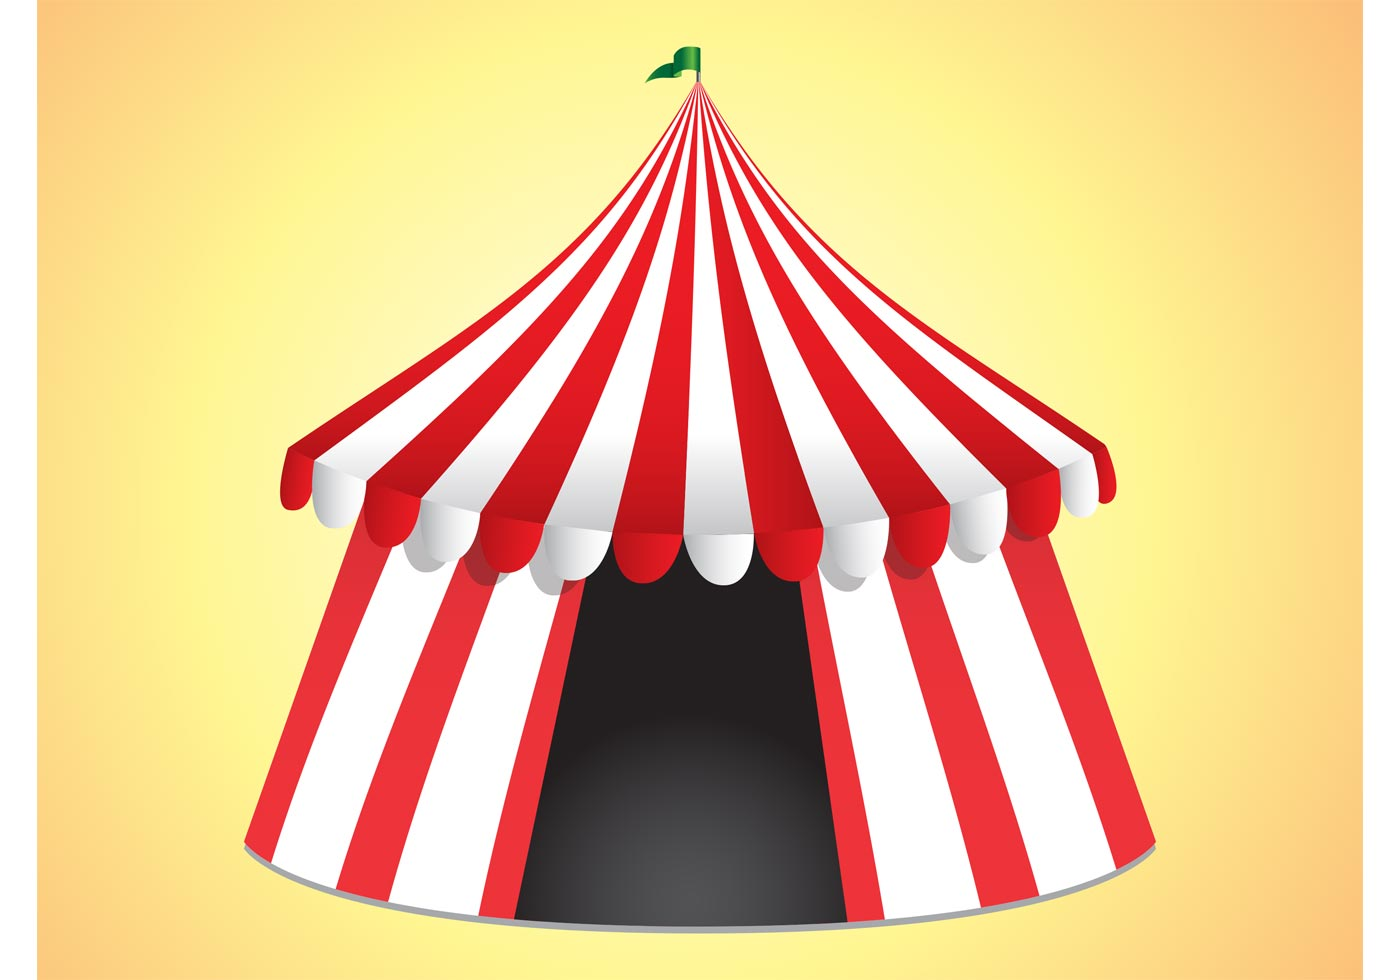 Circus Tent - Download Free Vector Art, Stock Graphics ...